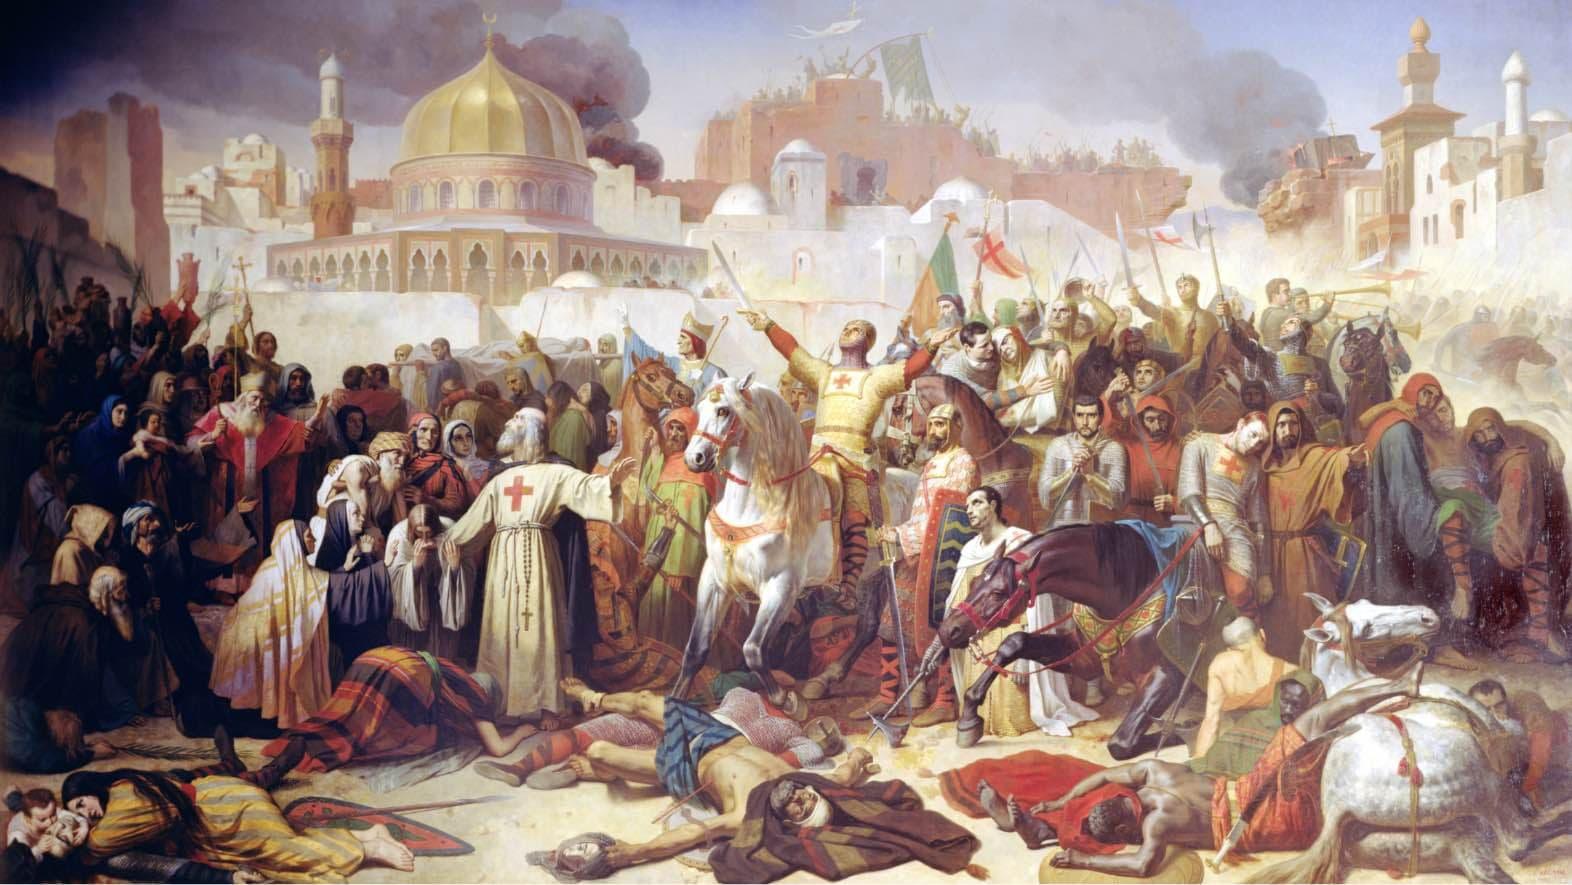 Conquest of Jerusalem 1099 AD